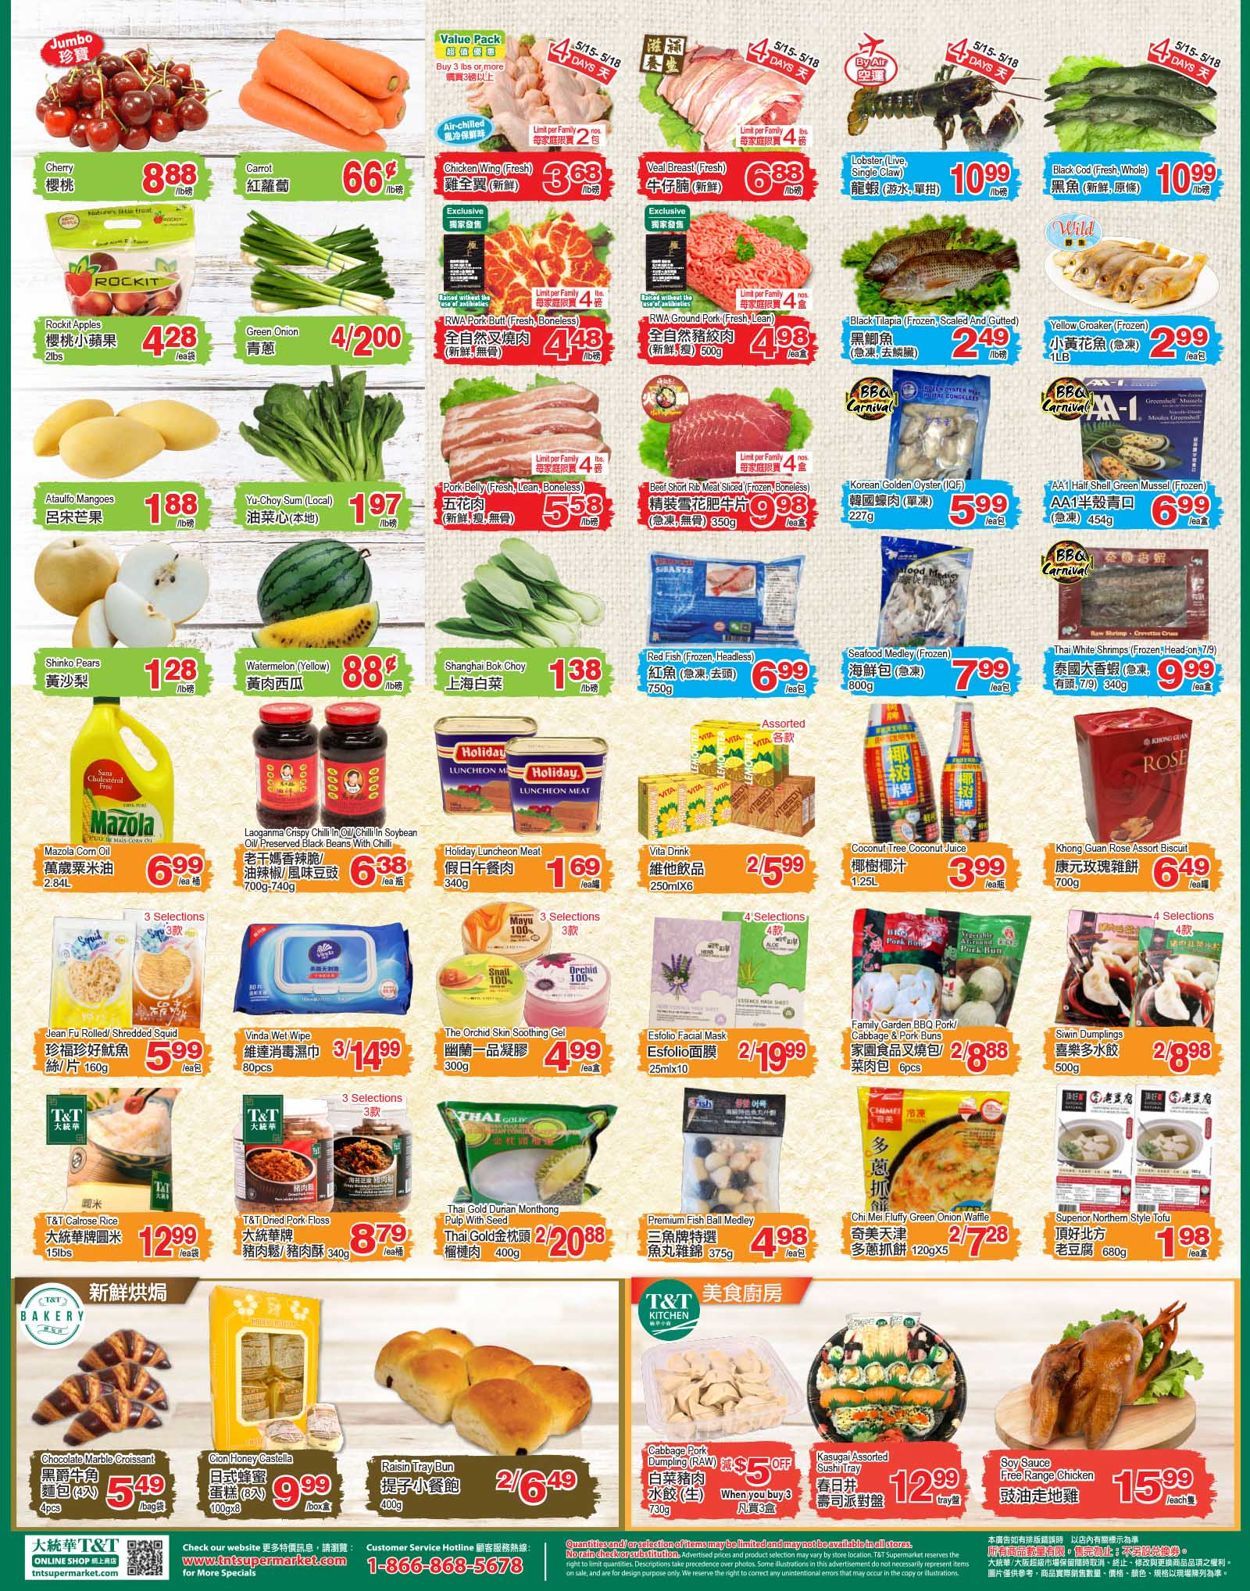 T&T Supermarket Flyer - 05/15-05/21/2020 (Page 2)